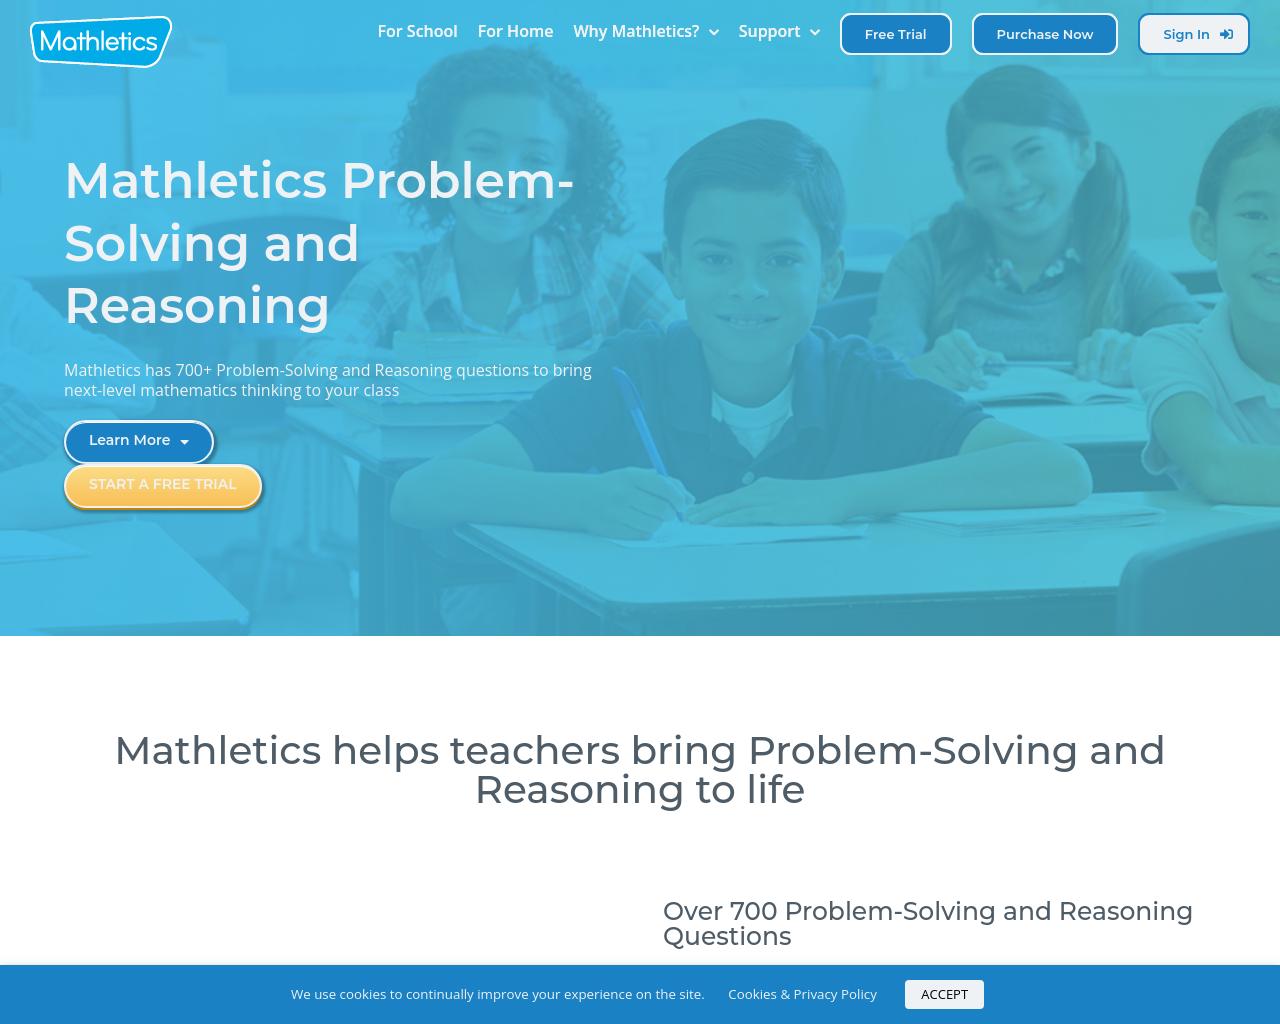 Mathletics Problem Solving and Reasoning